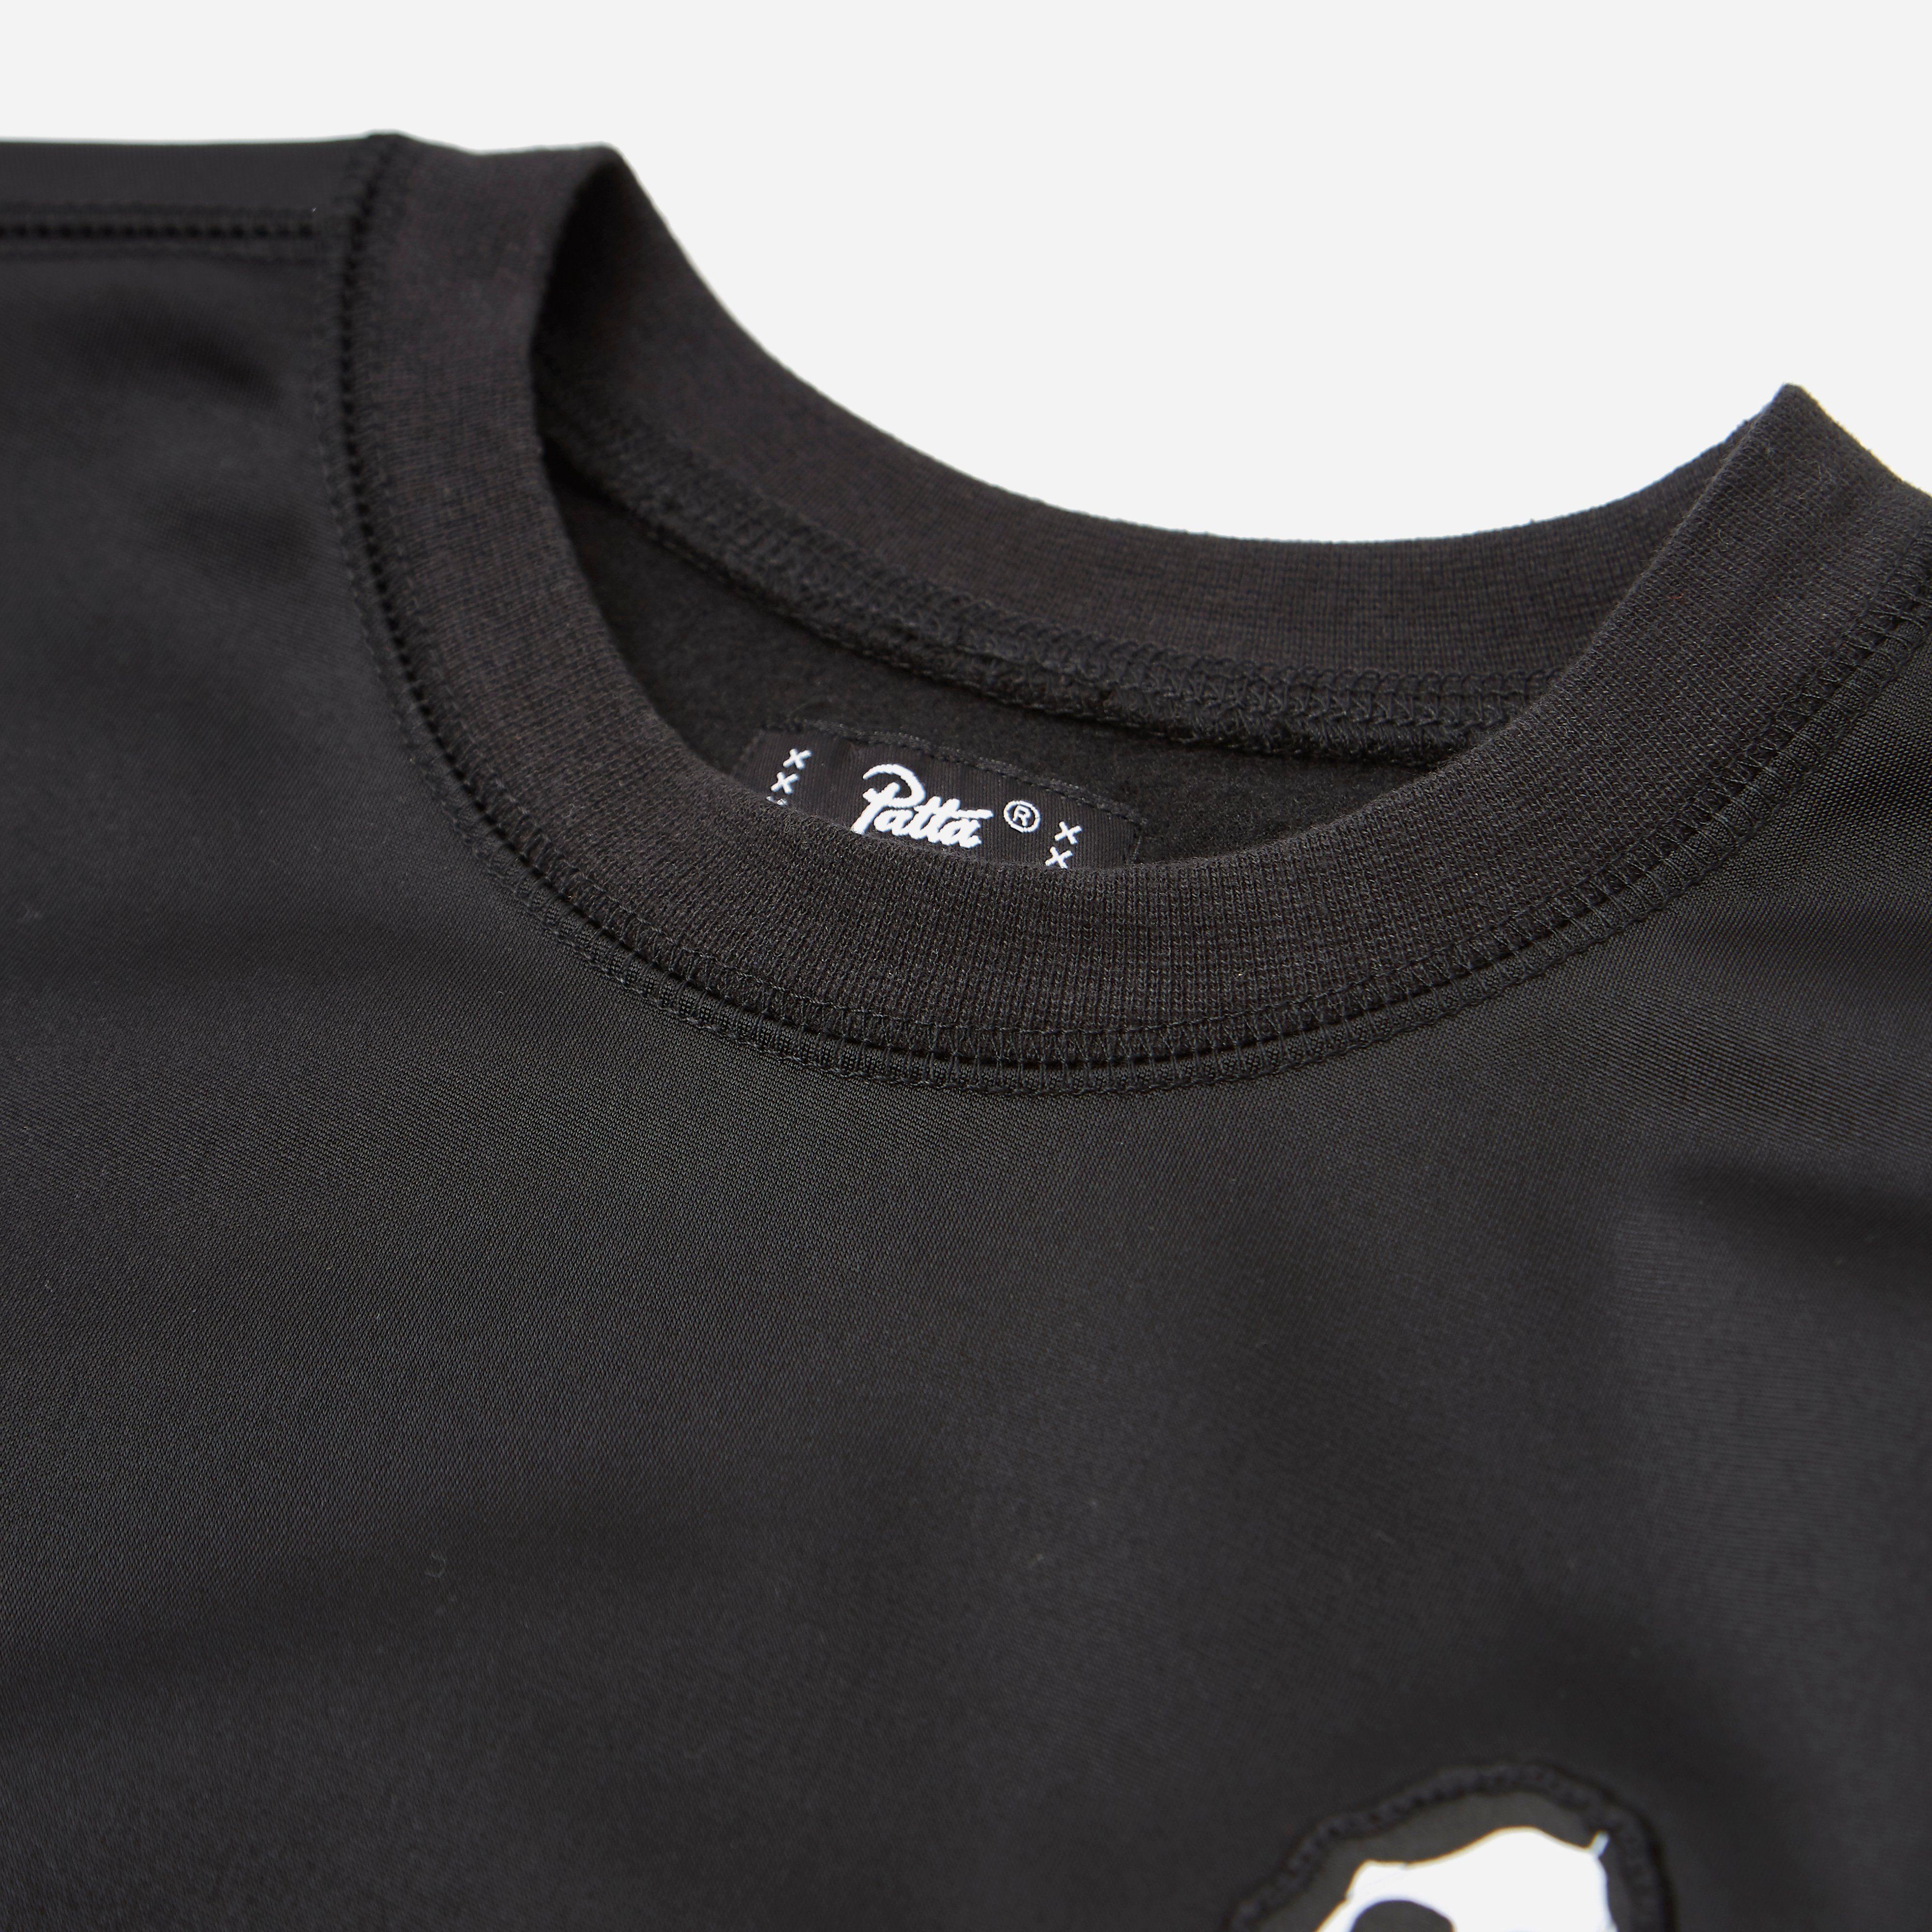 Patta Script Logo Warm Up Sweatshirt